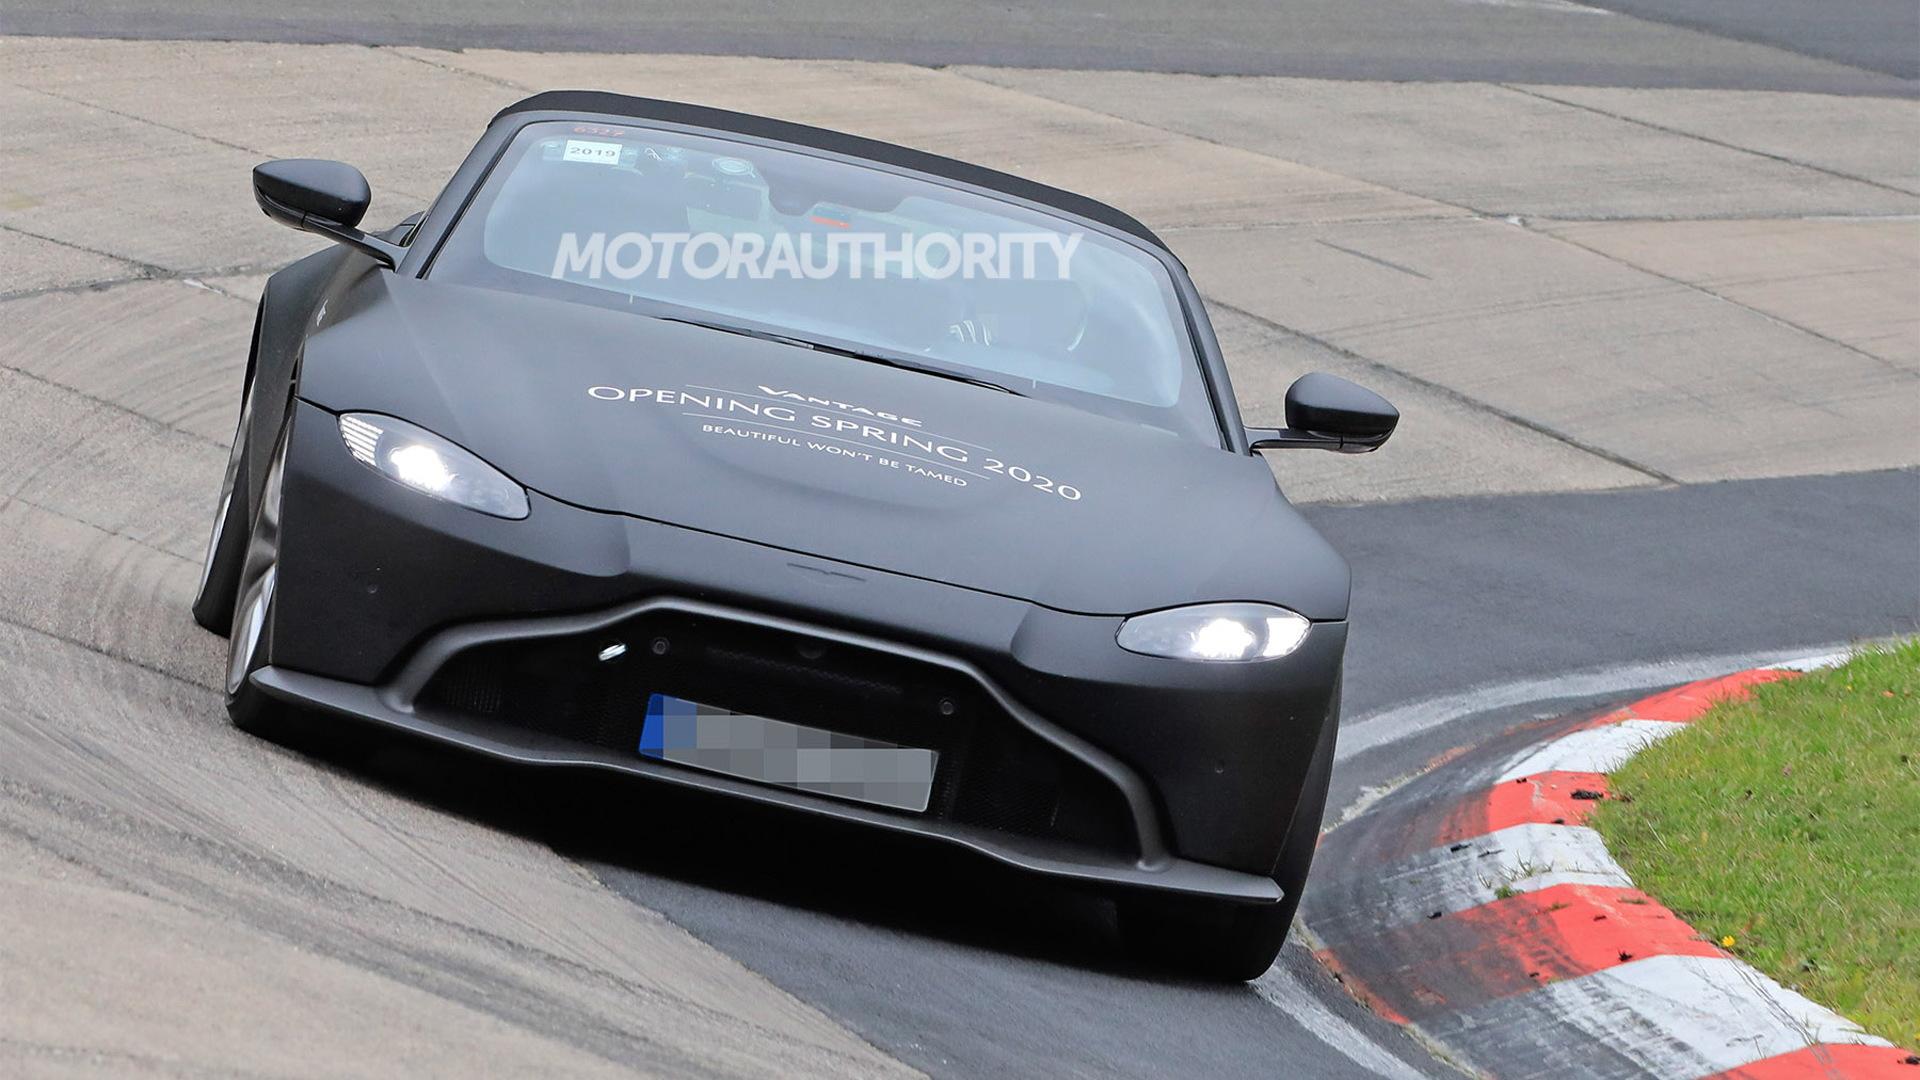 2020 Aston Martin Vantage Roadster spy shots - Photo credit: S. Baldauf/SB-Medien